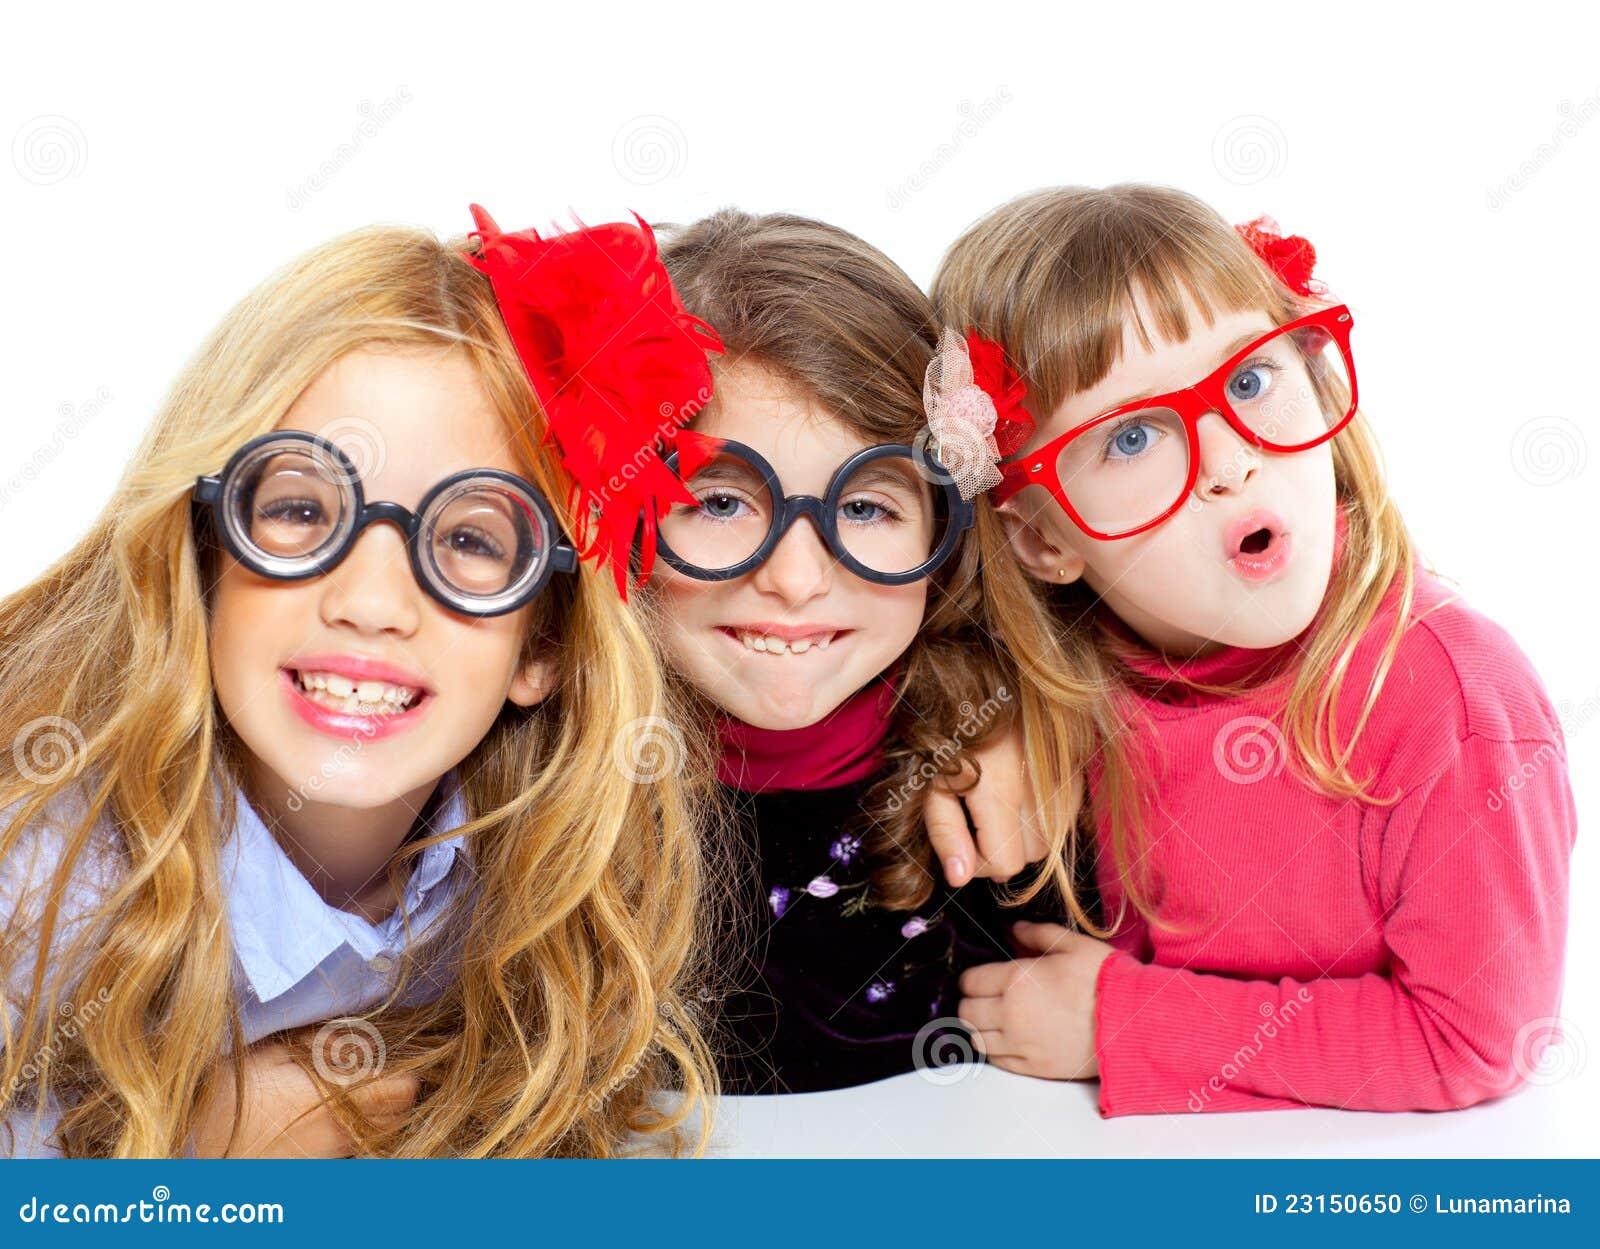 122982d943 Ομάδα κοριτσιών παιδιών Nerd με τα αστεία γυαλιά Στοκ Εικόνες ...